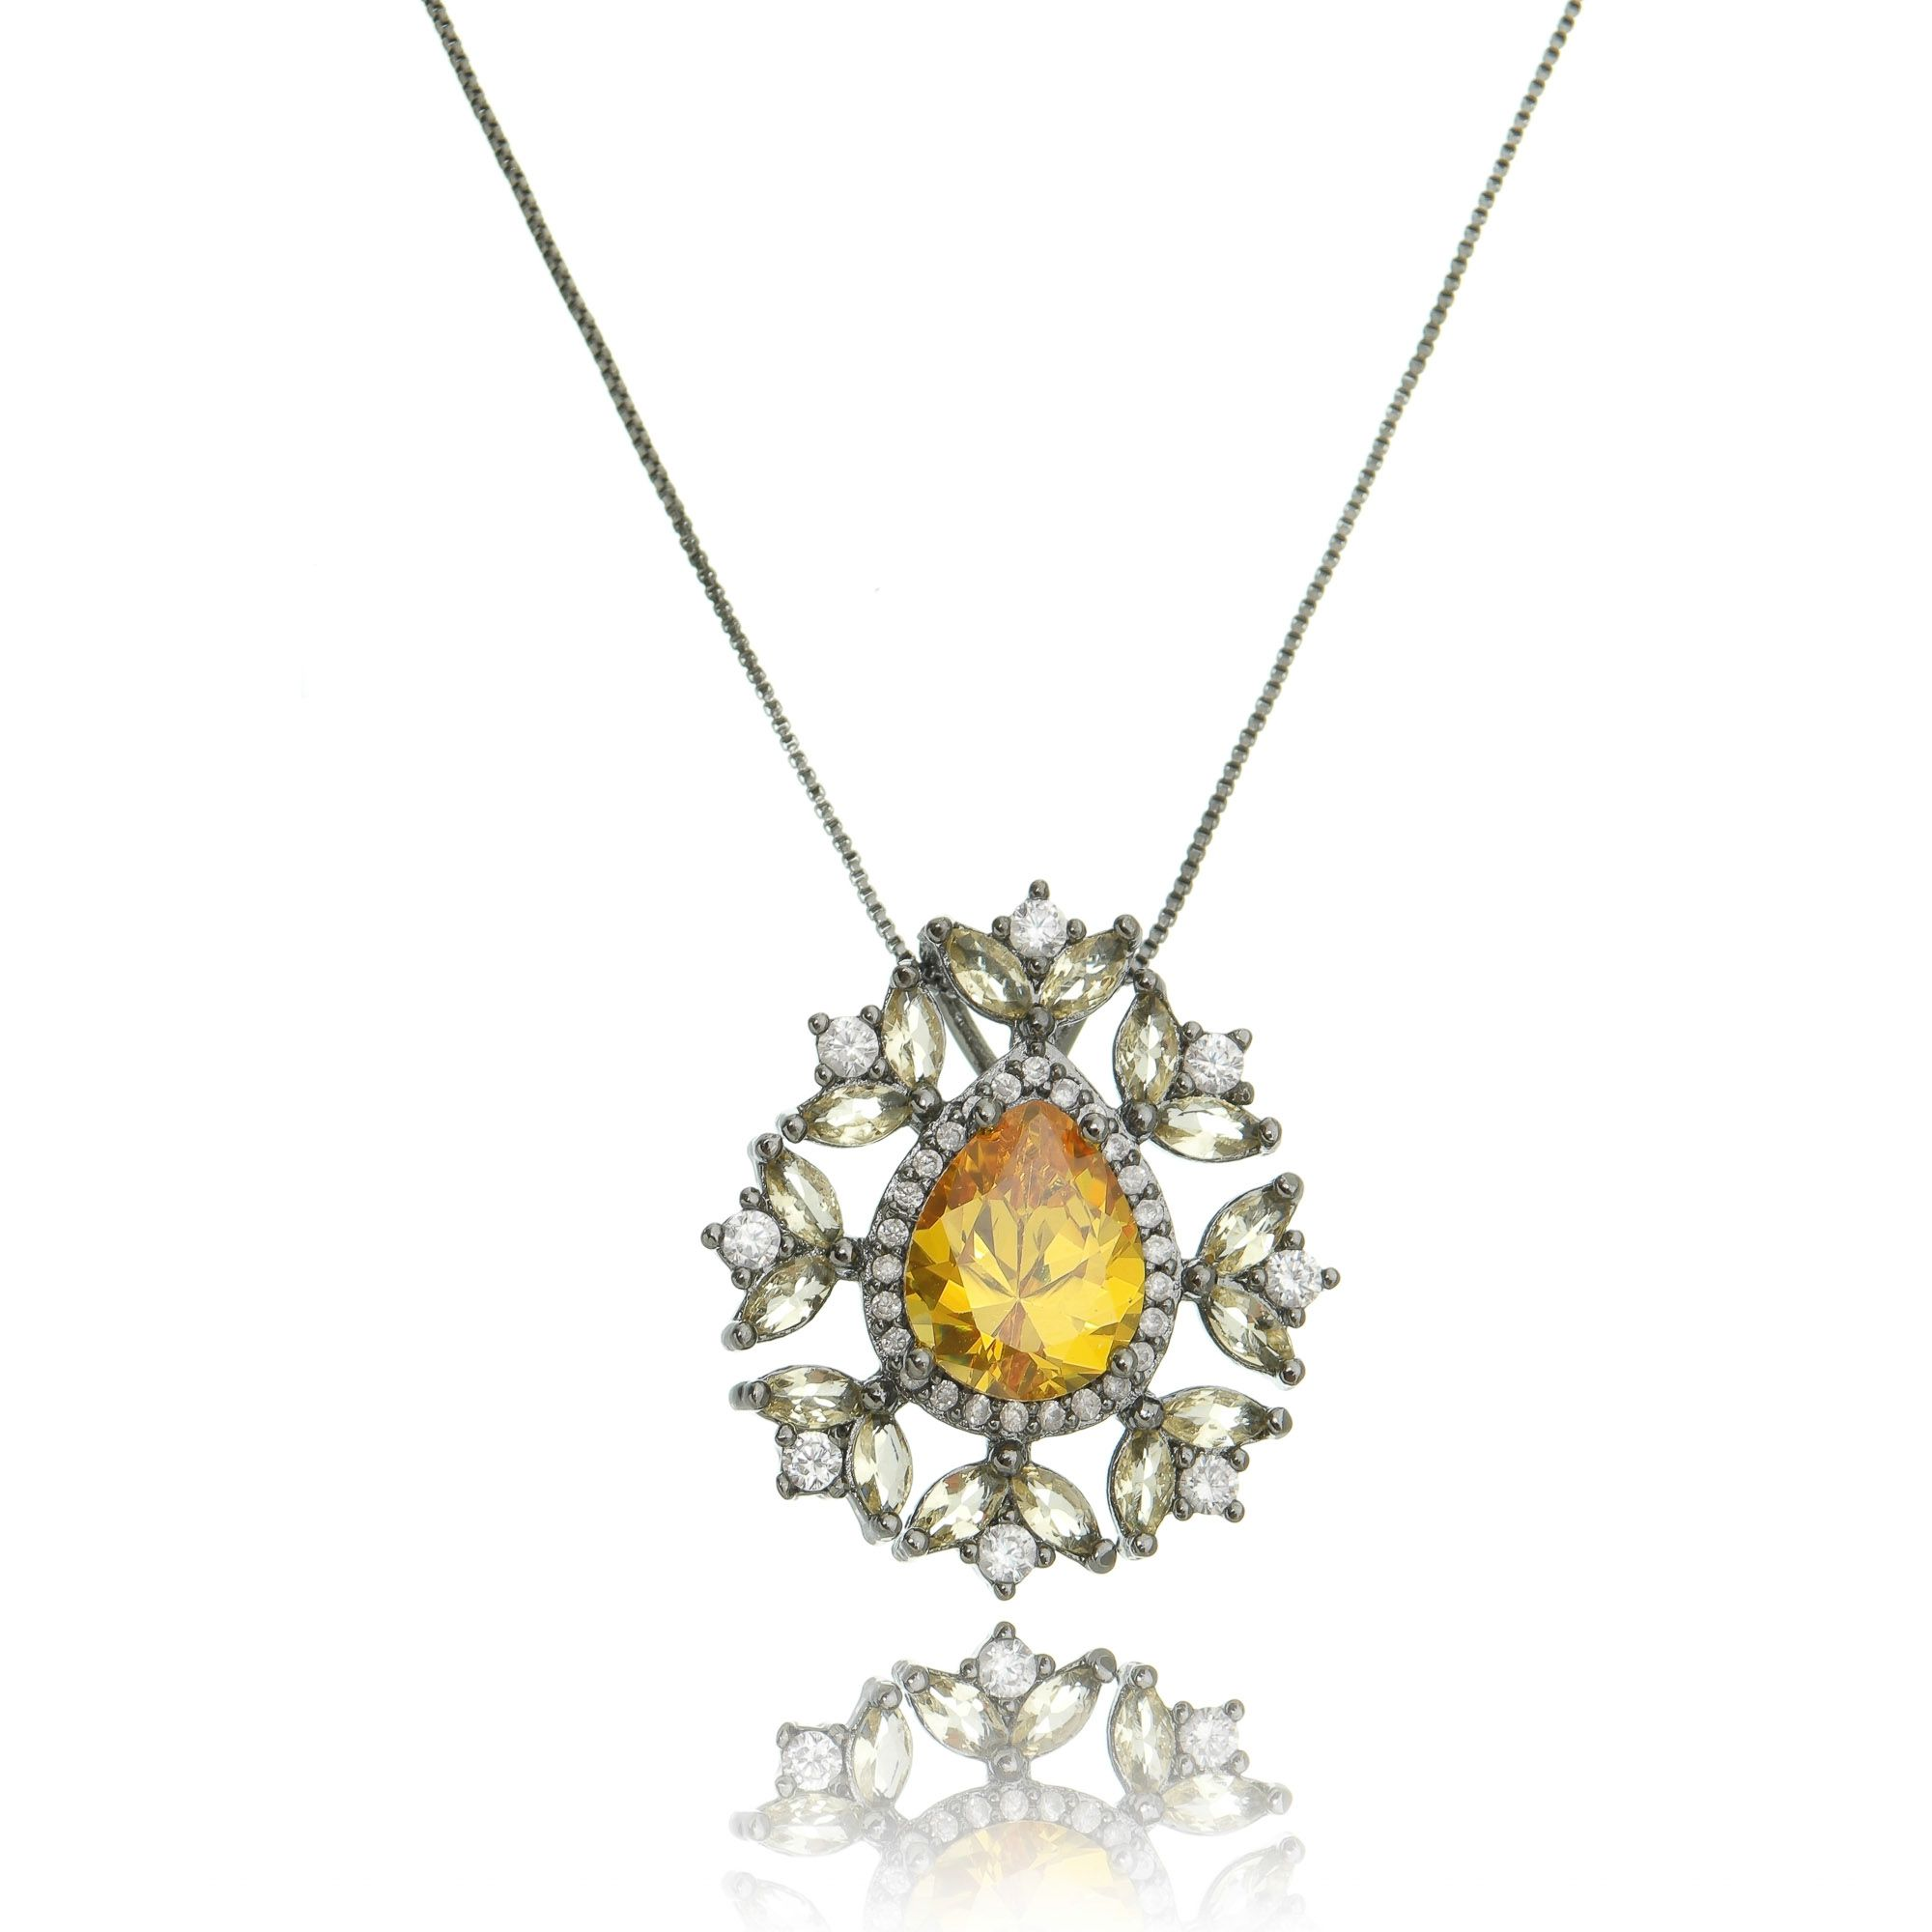 Colar Luxuoso Ródio Negro Gota Amarela e Zircônia Cristal Semijoia Fashion  - Soloyou